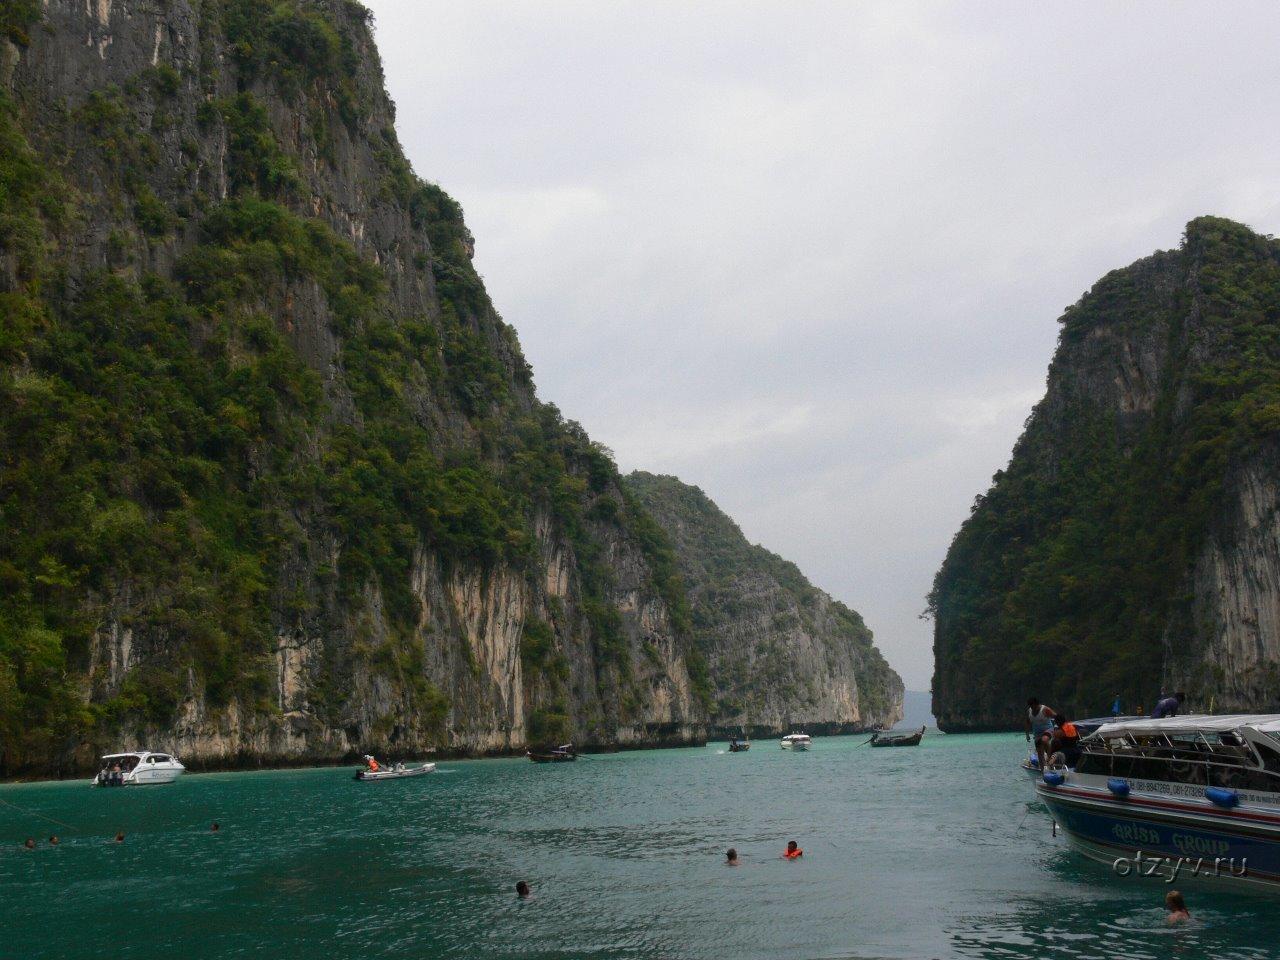 Phuket Webcams TOP-25 Live Webcams Phuket! Phuket thailand pictures slideshow